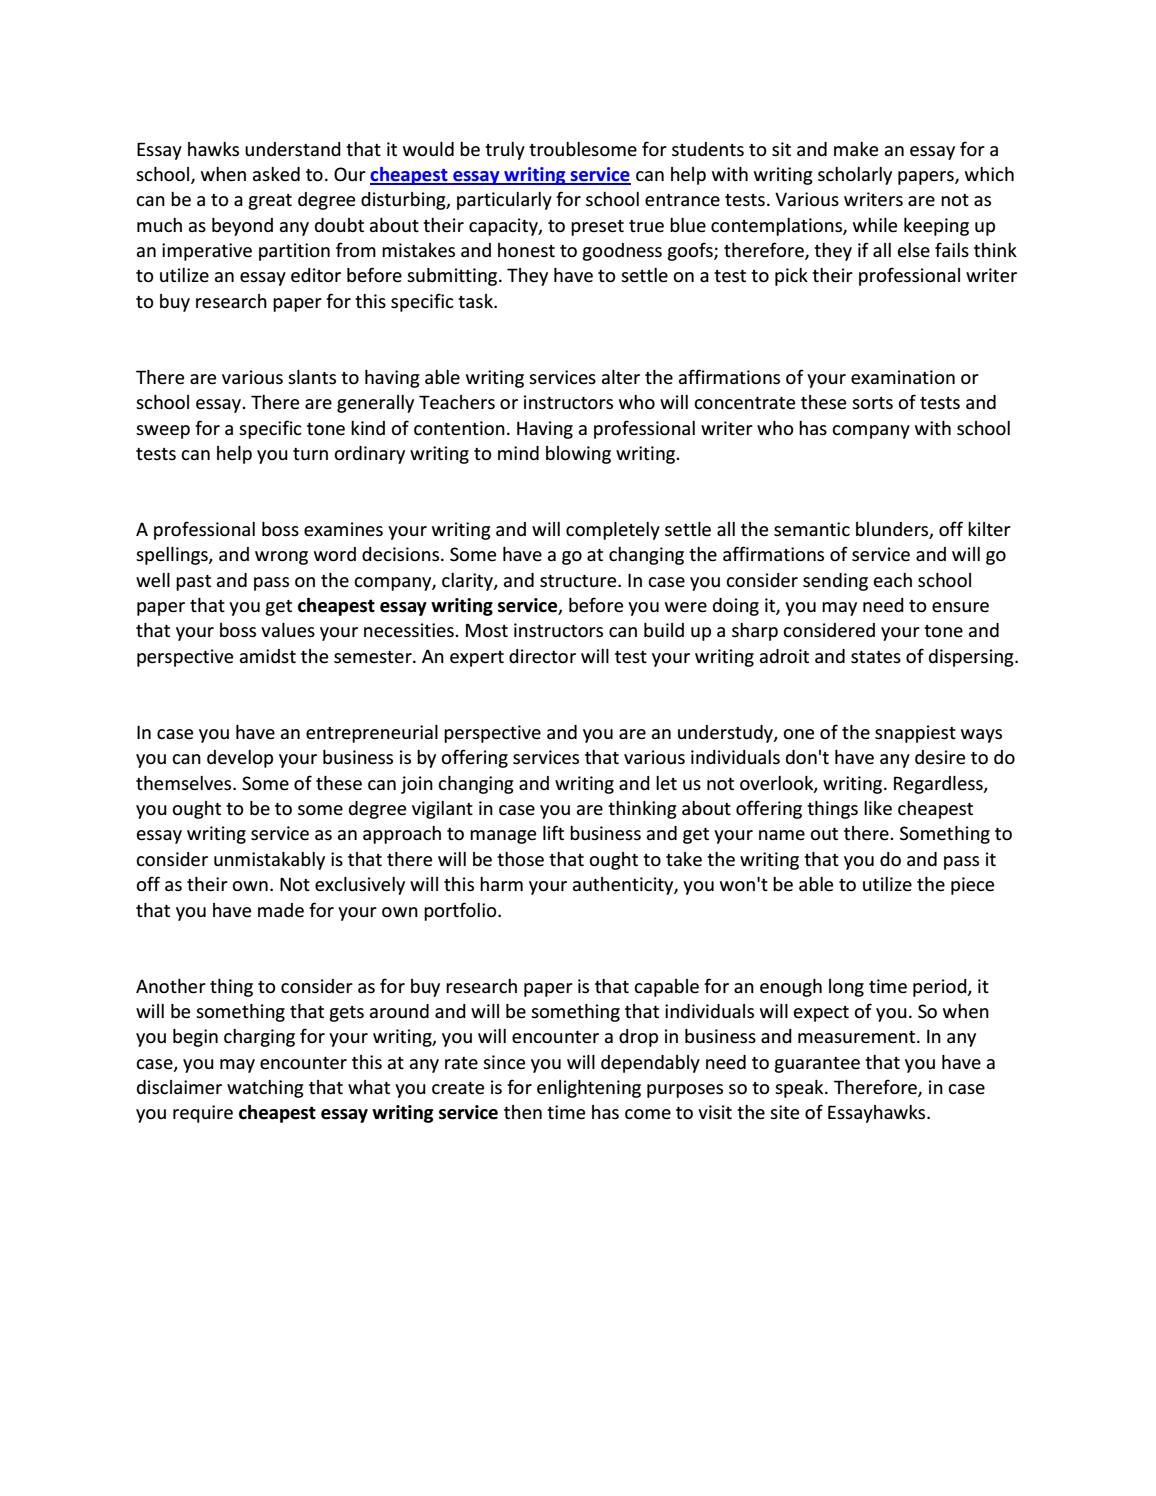 professional school essay writers service